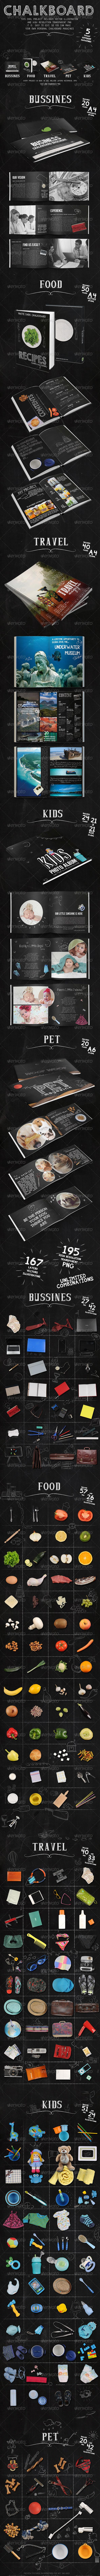 GraphicRiver Chalkboard Bundle 7675449